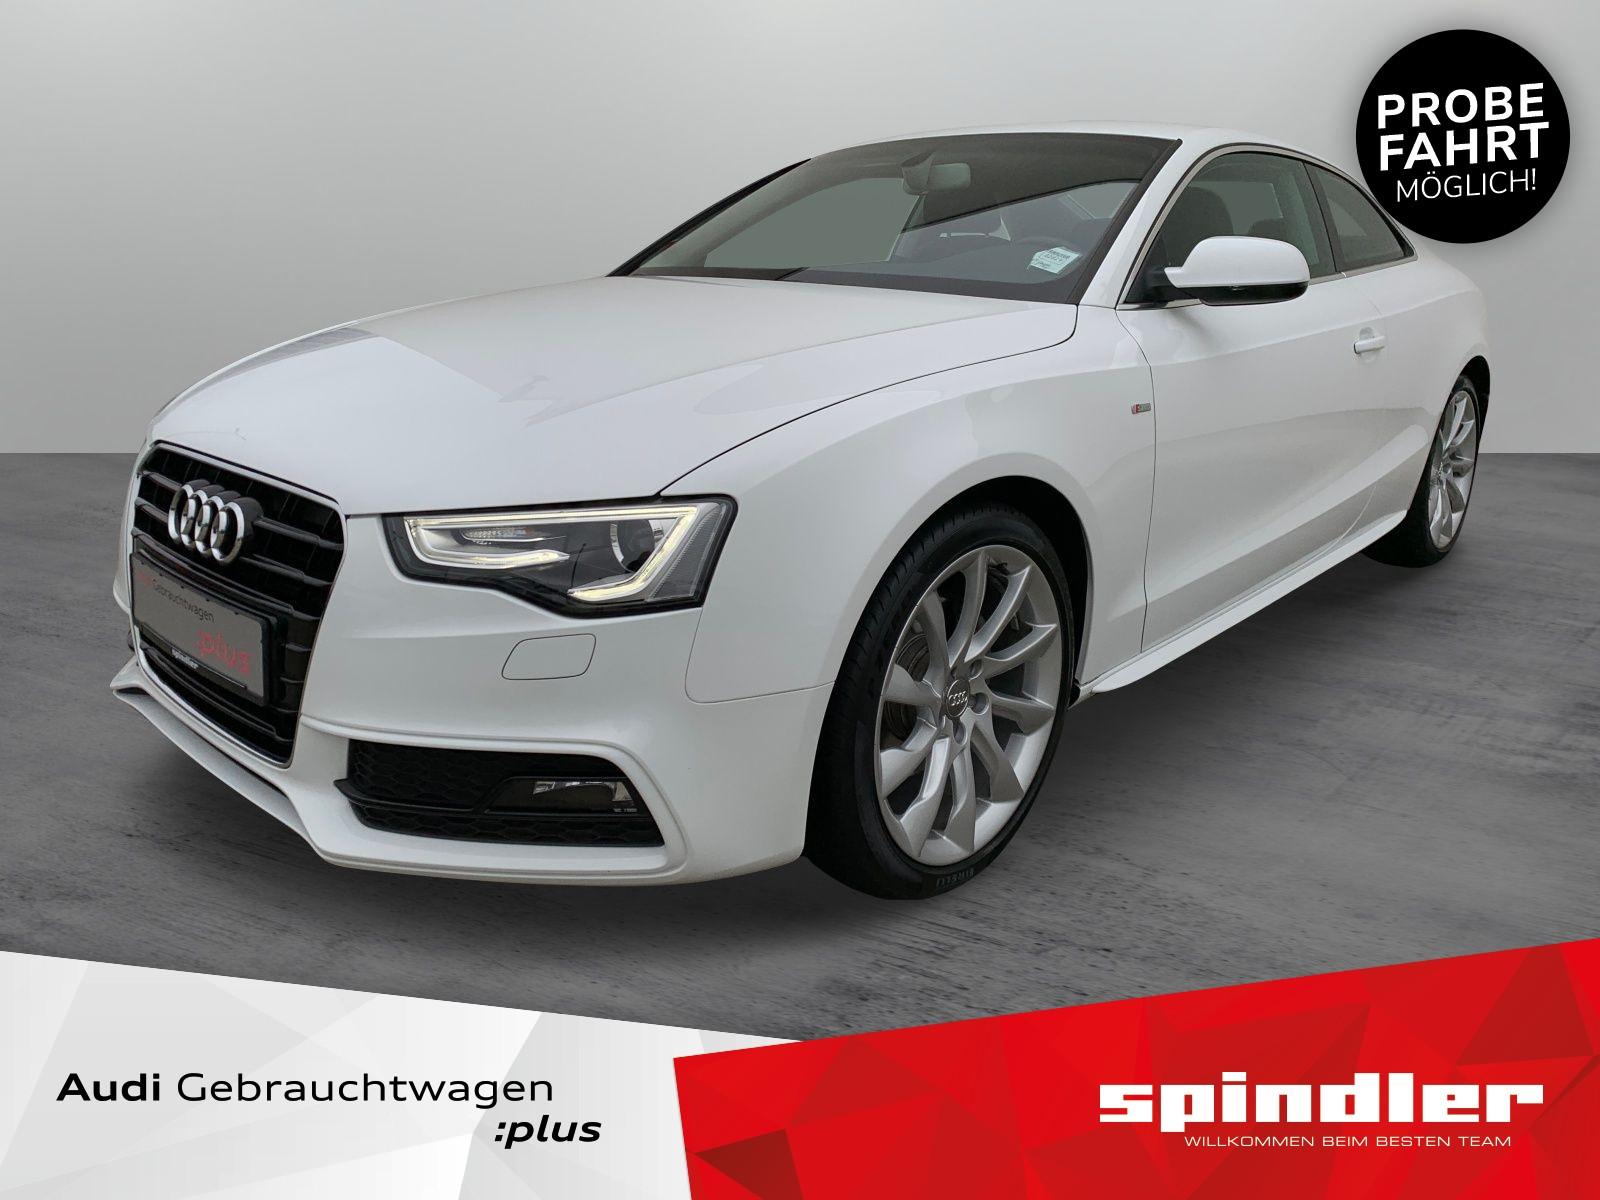 Audi A5 Coupé 1.8 TFSI S-Line Selection / MMI-Navi, Jahr 2014, Benzin